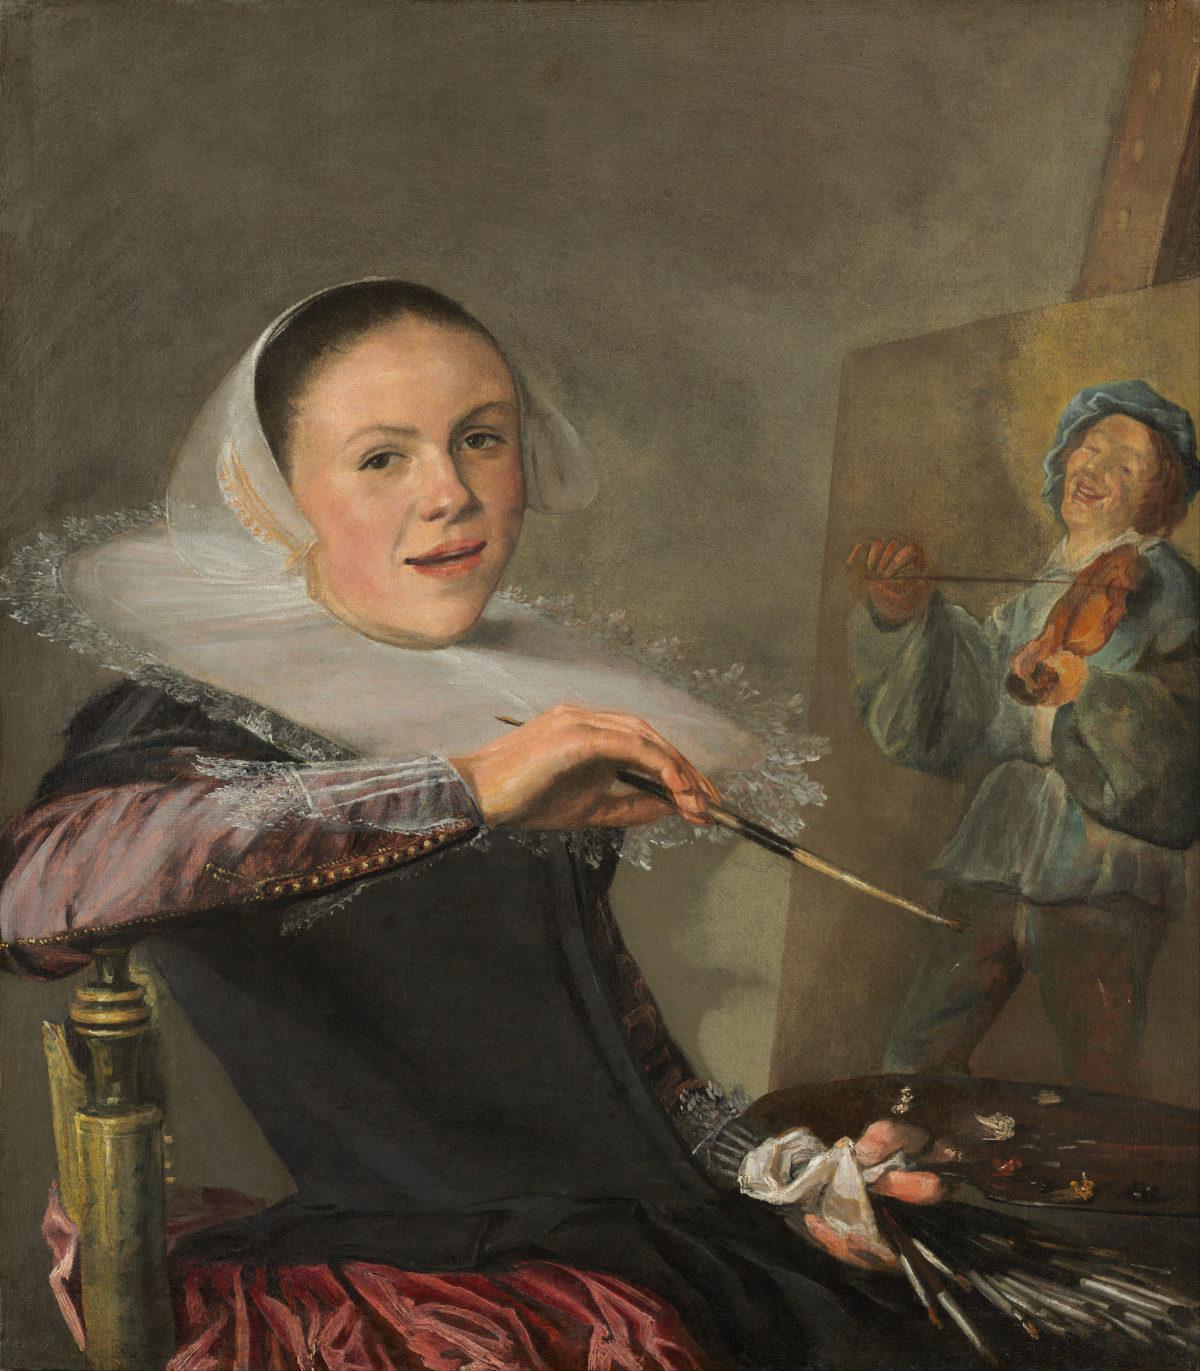 Judith-Leyster_Self-Portrait-e1489606708299.jpg